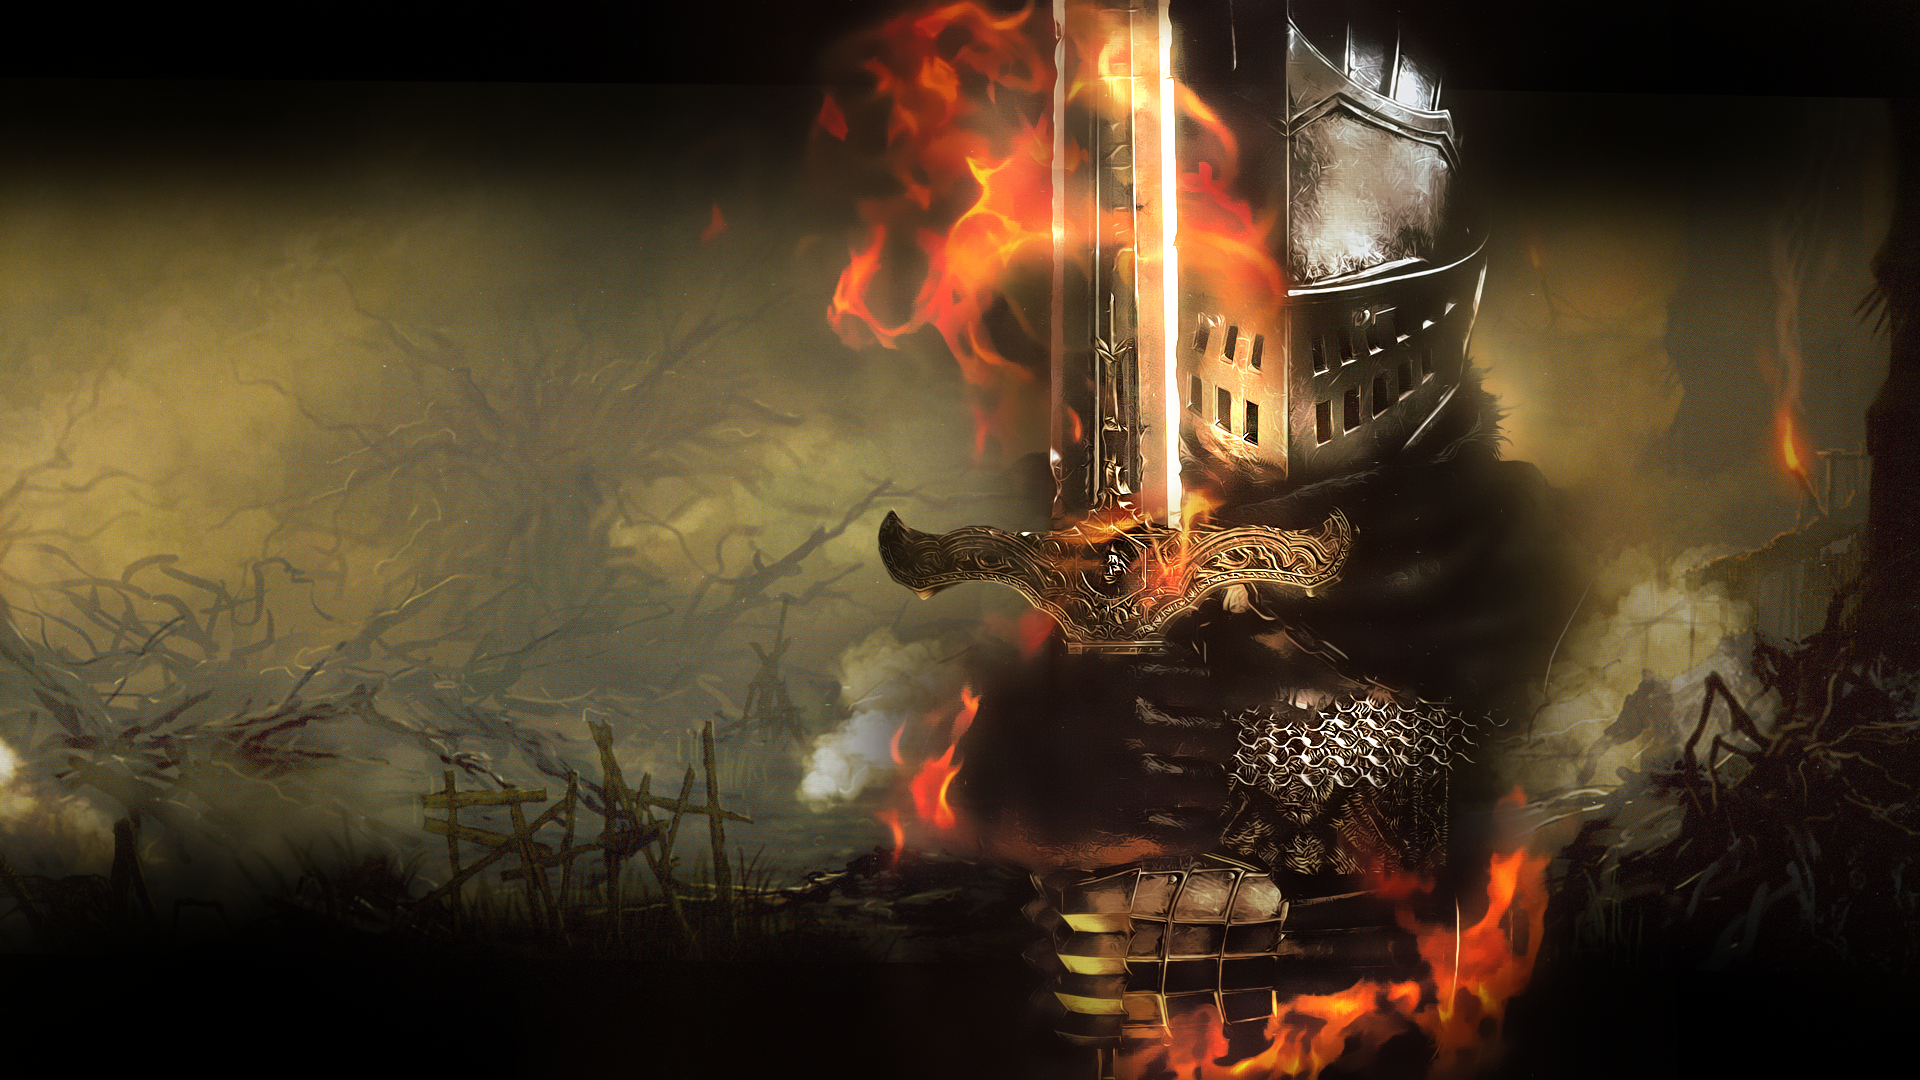 Dark Souls 3 Hd Wallpaper: Dark Souls Full HD Wallpaper And Background Image